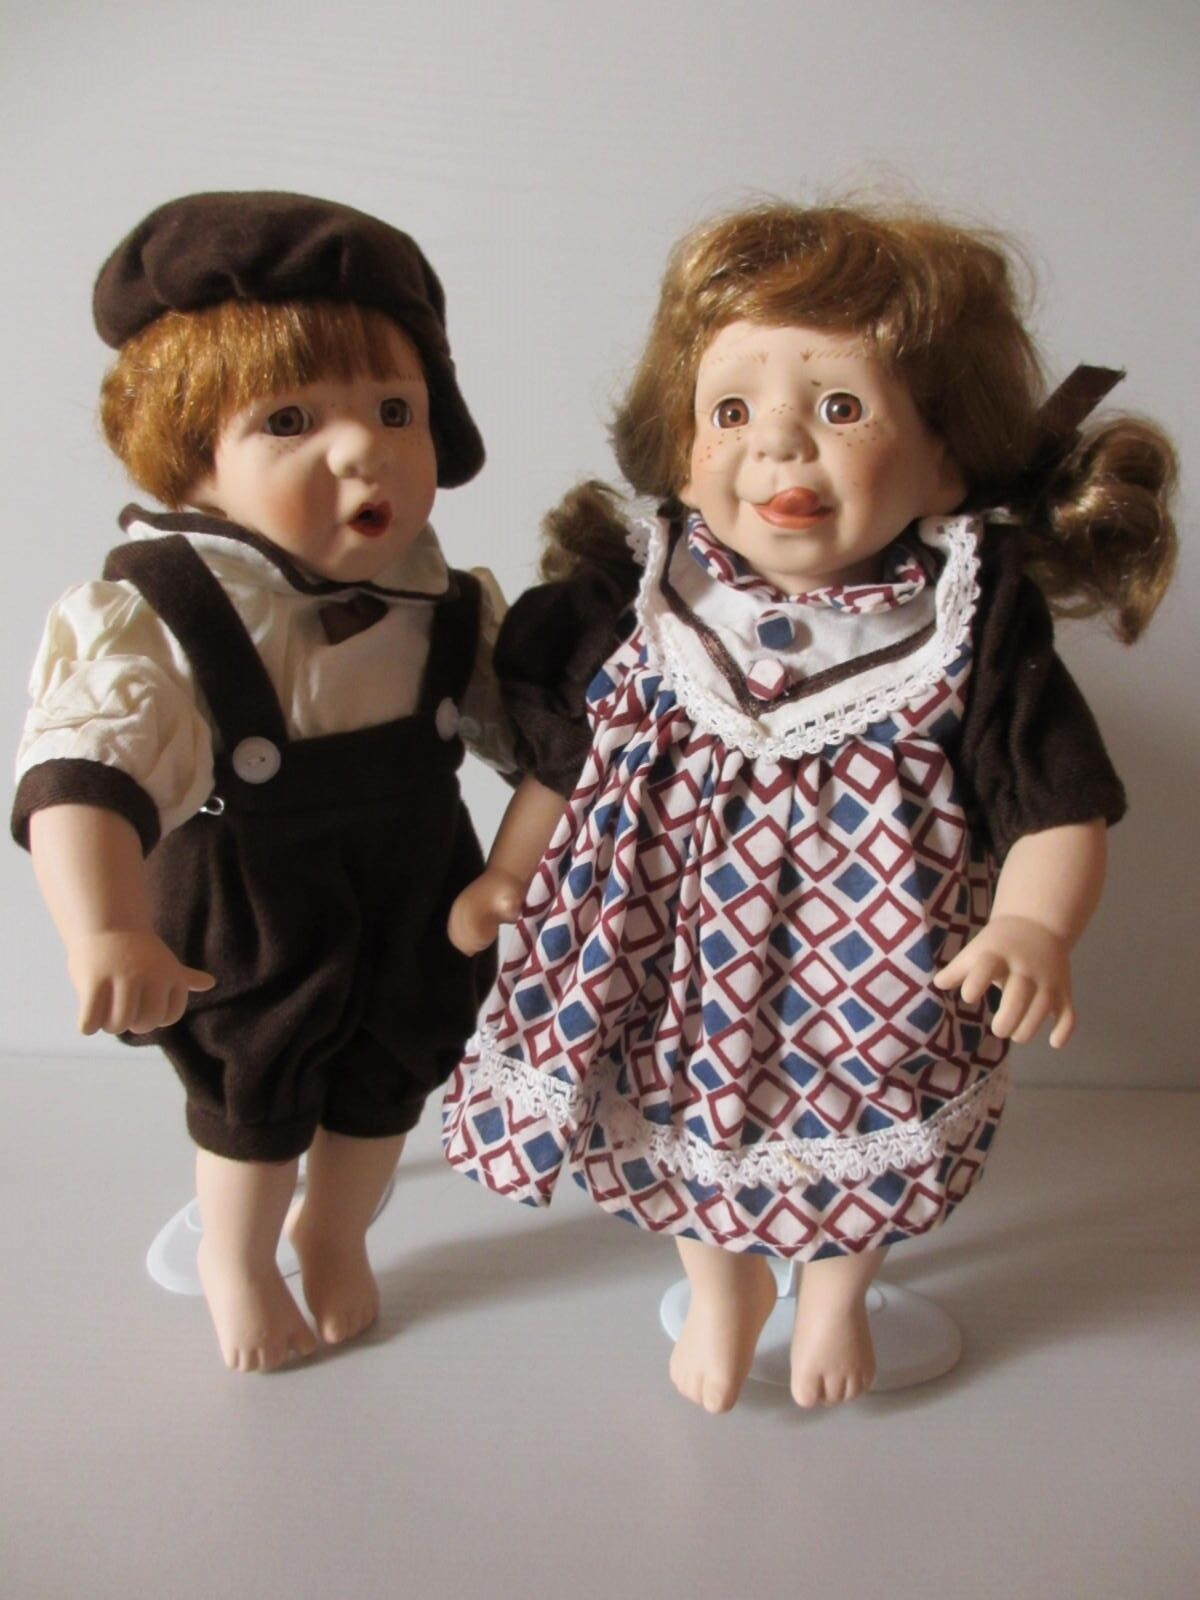 2 Porzellanpuppen Porzellanpuppen Porzellanpuppen 29cm Junge und Mädchen Puppenpaar Charakterpuppe frech Zunge a46b82